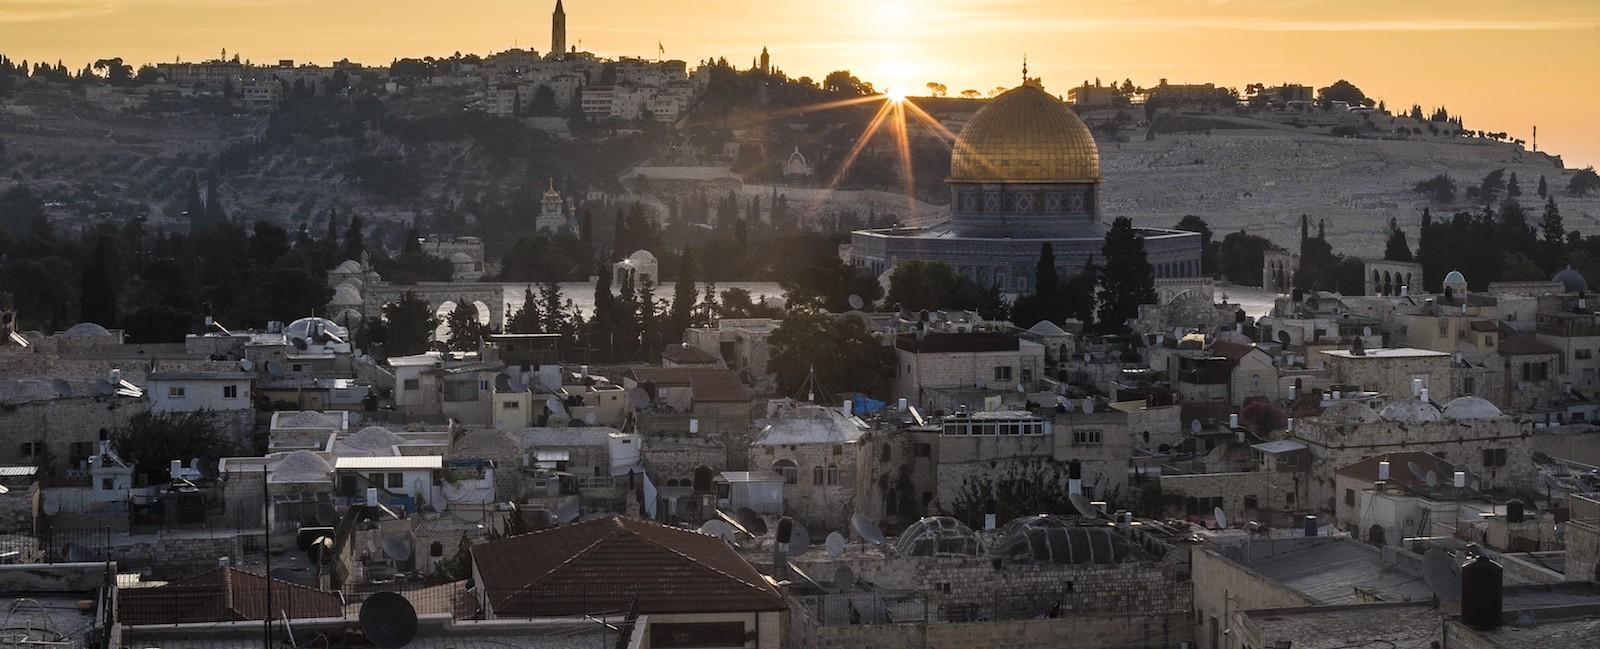 Jerusalem (Photo: Mostafa Alkharouf via Getty)